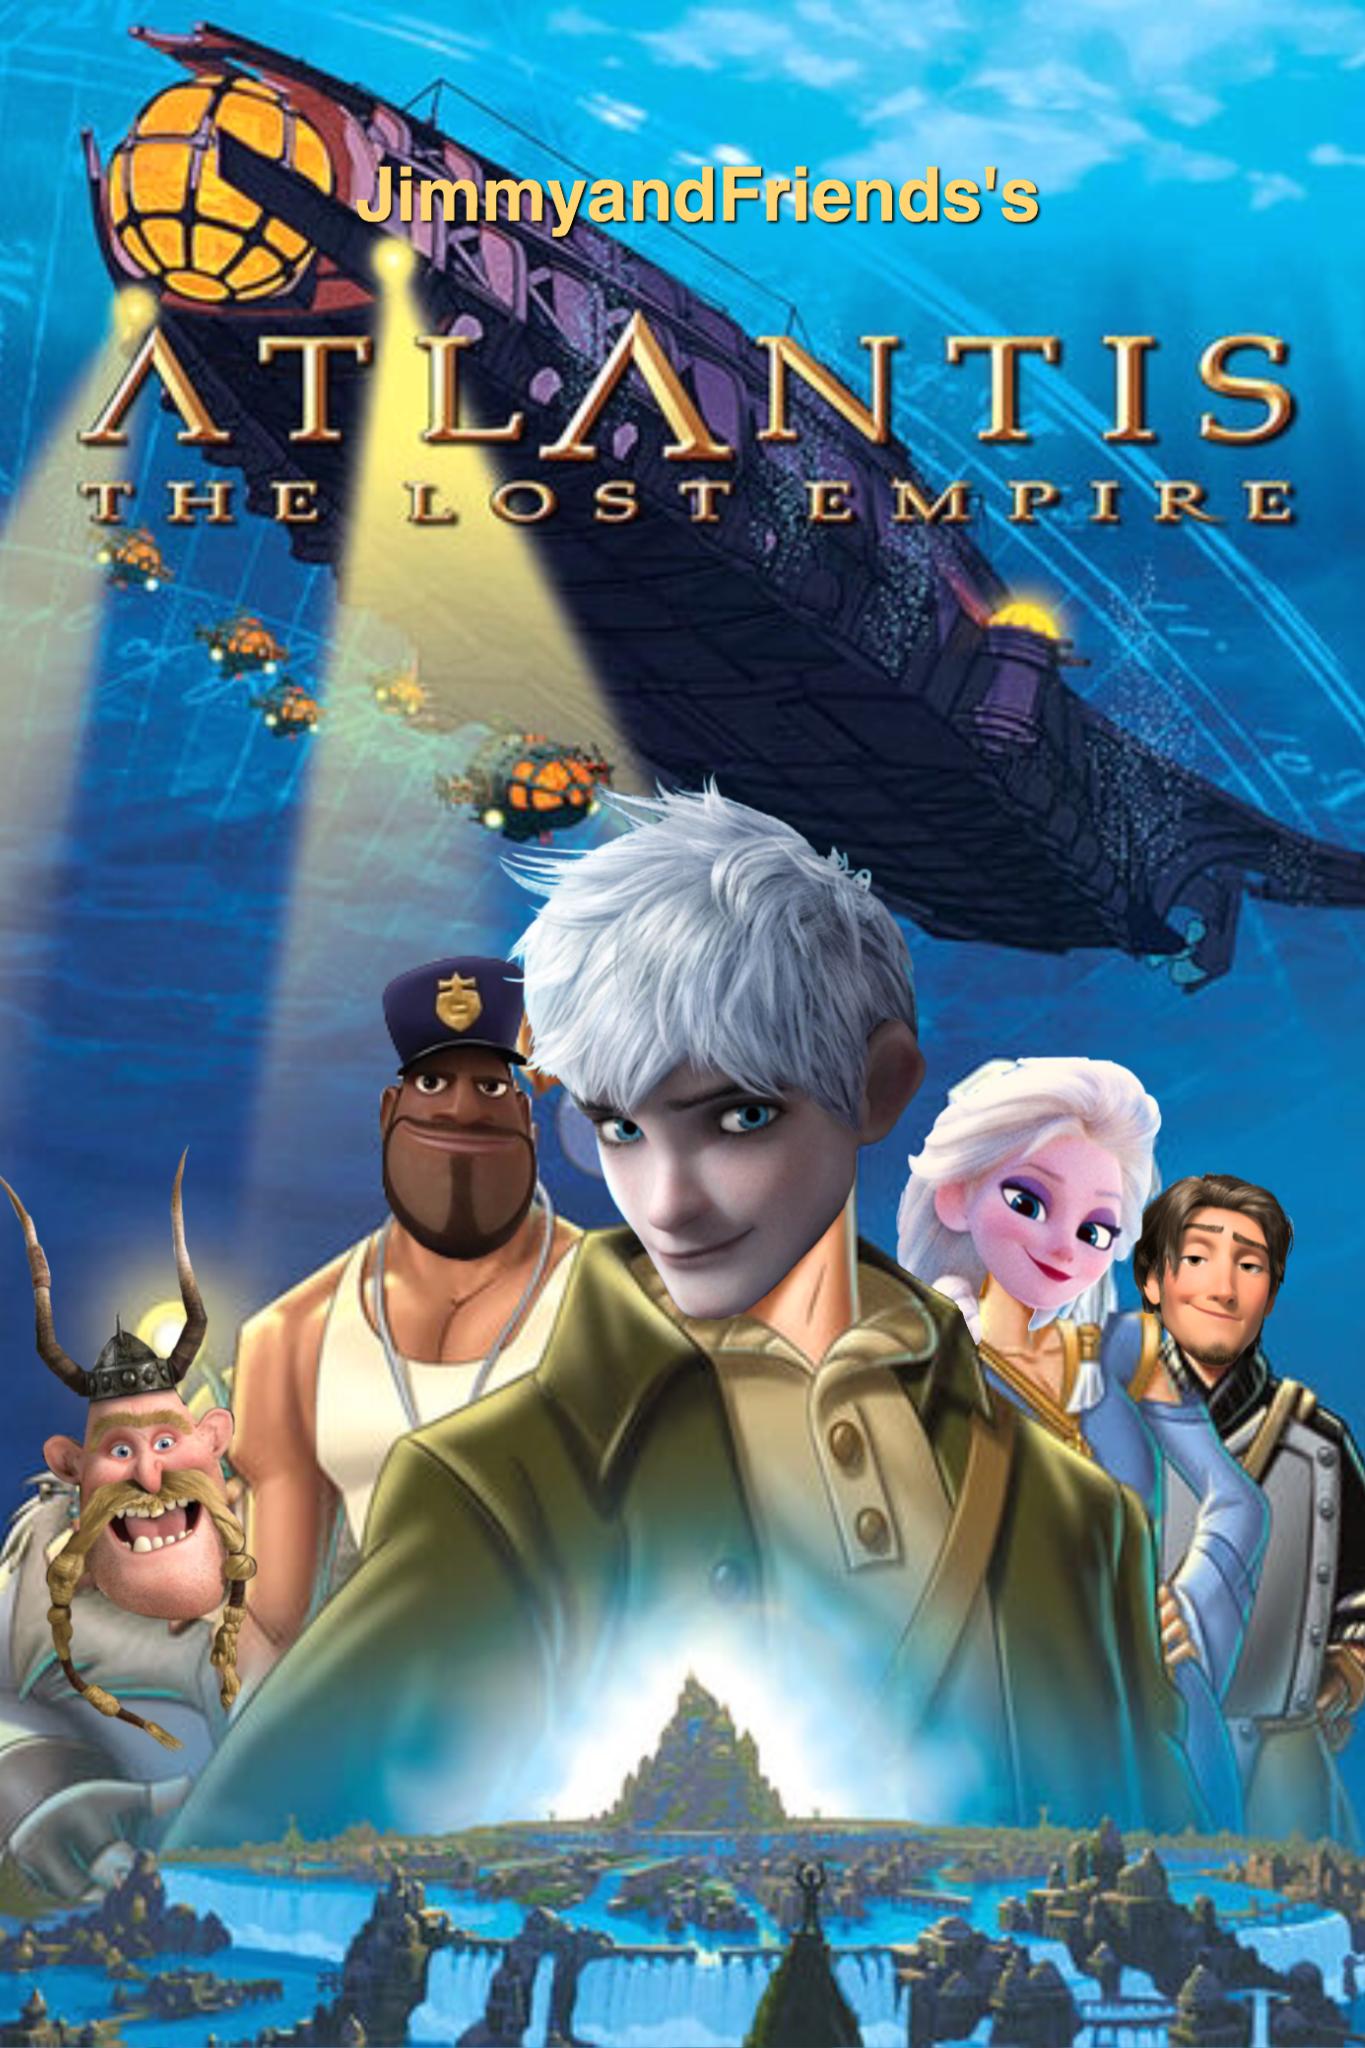 Atlantis: The Lost Empire (JimmyandFriends Style)